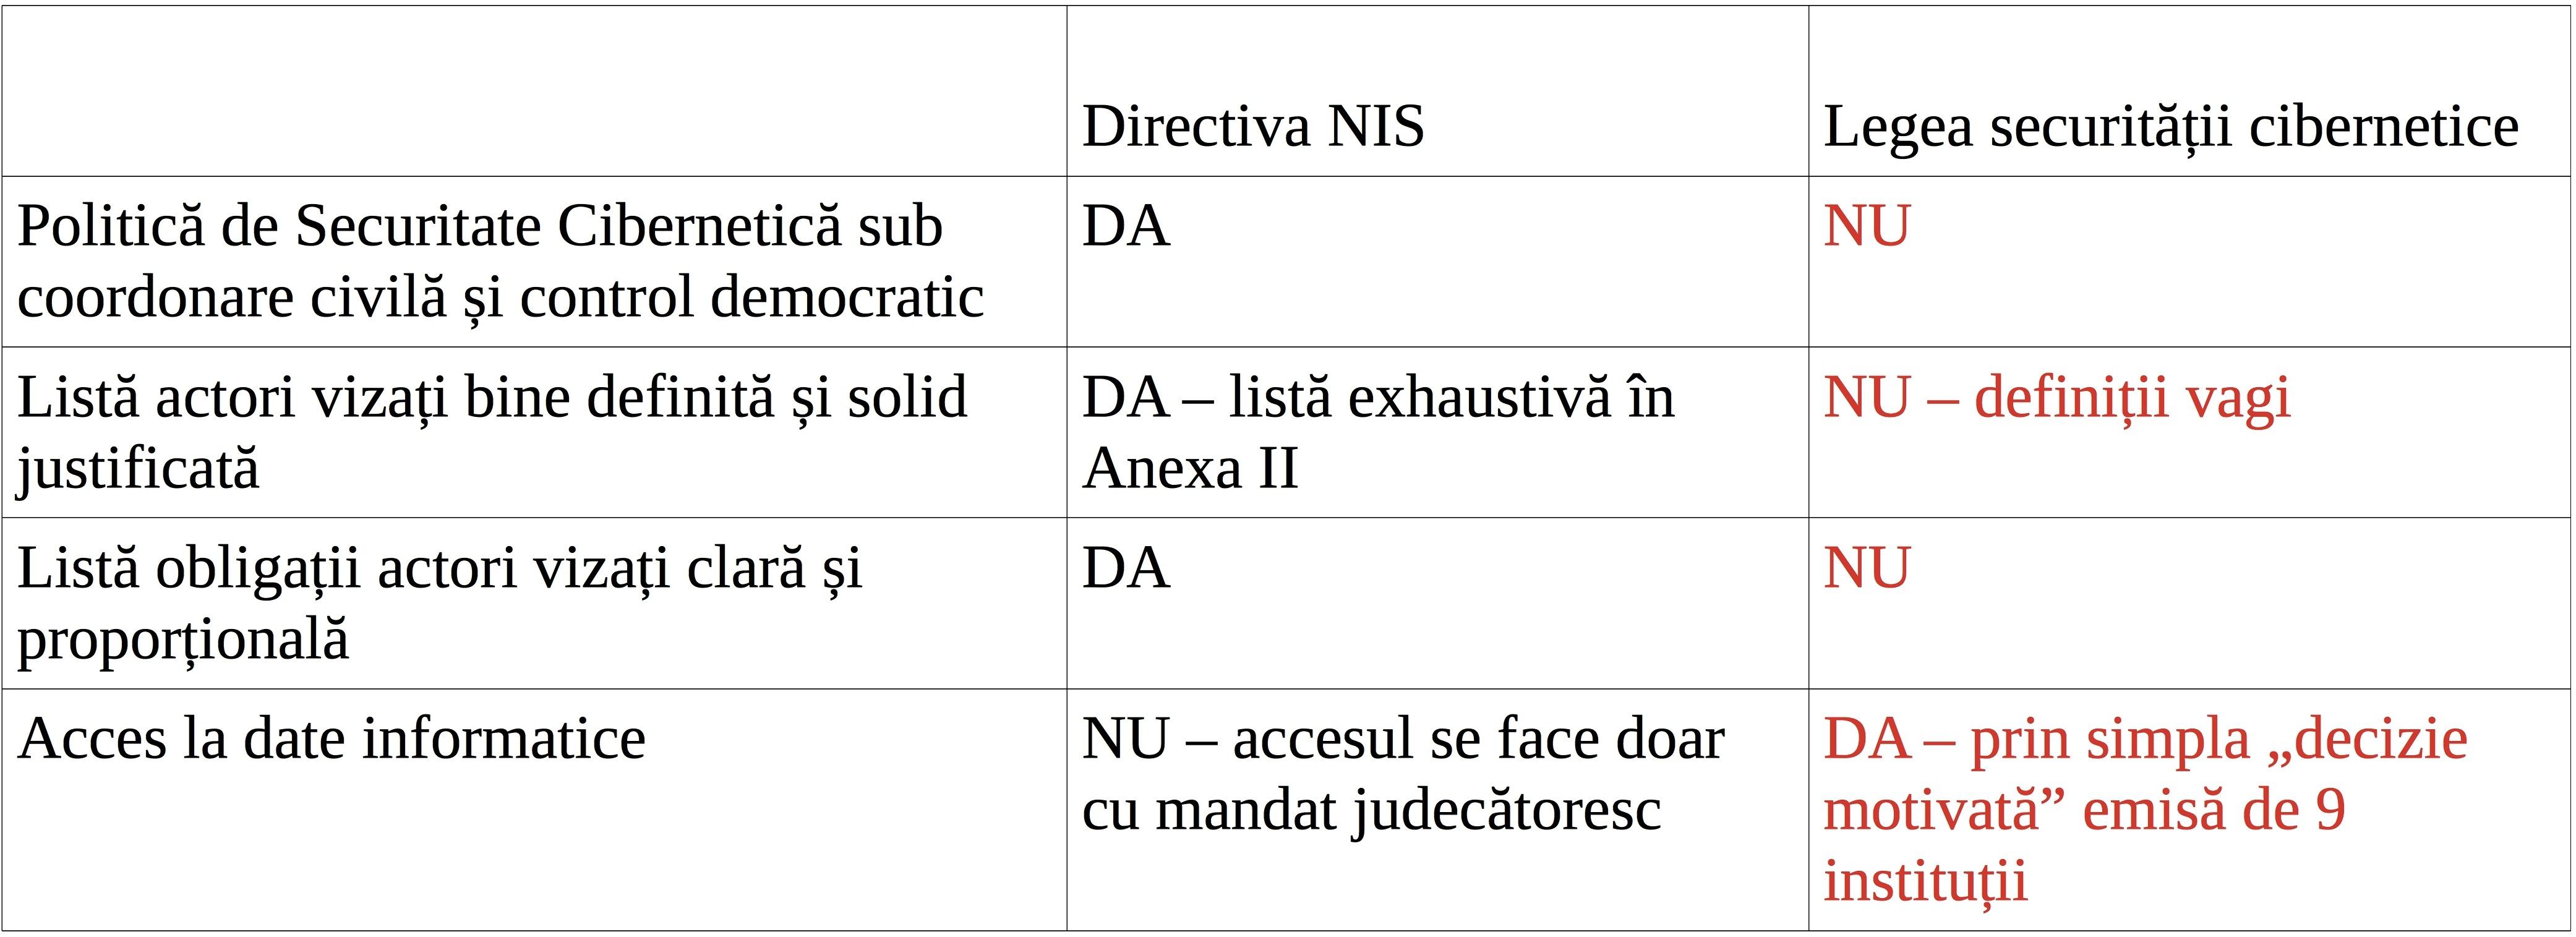 LSC vs NIS